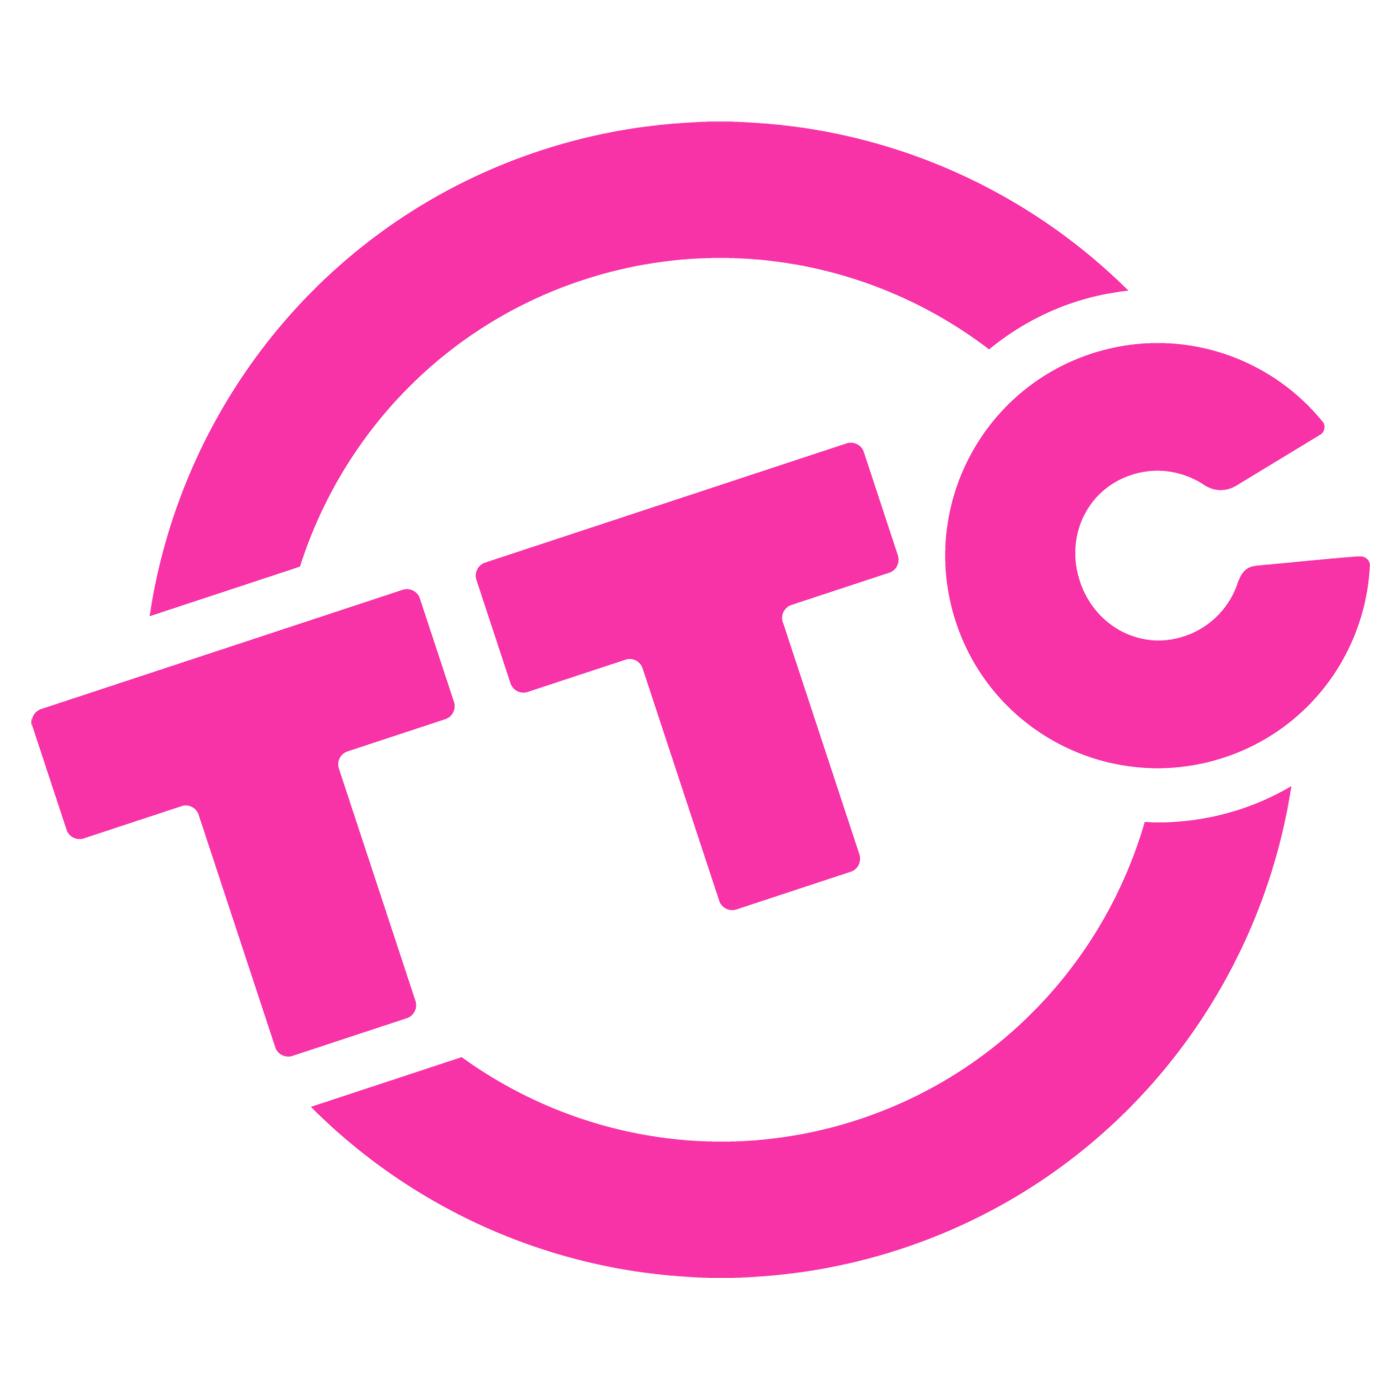 Logo de l'émission : TTC